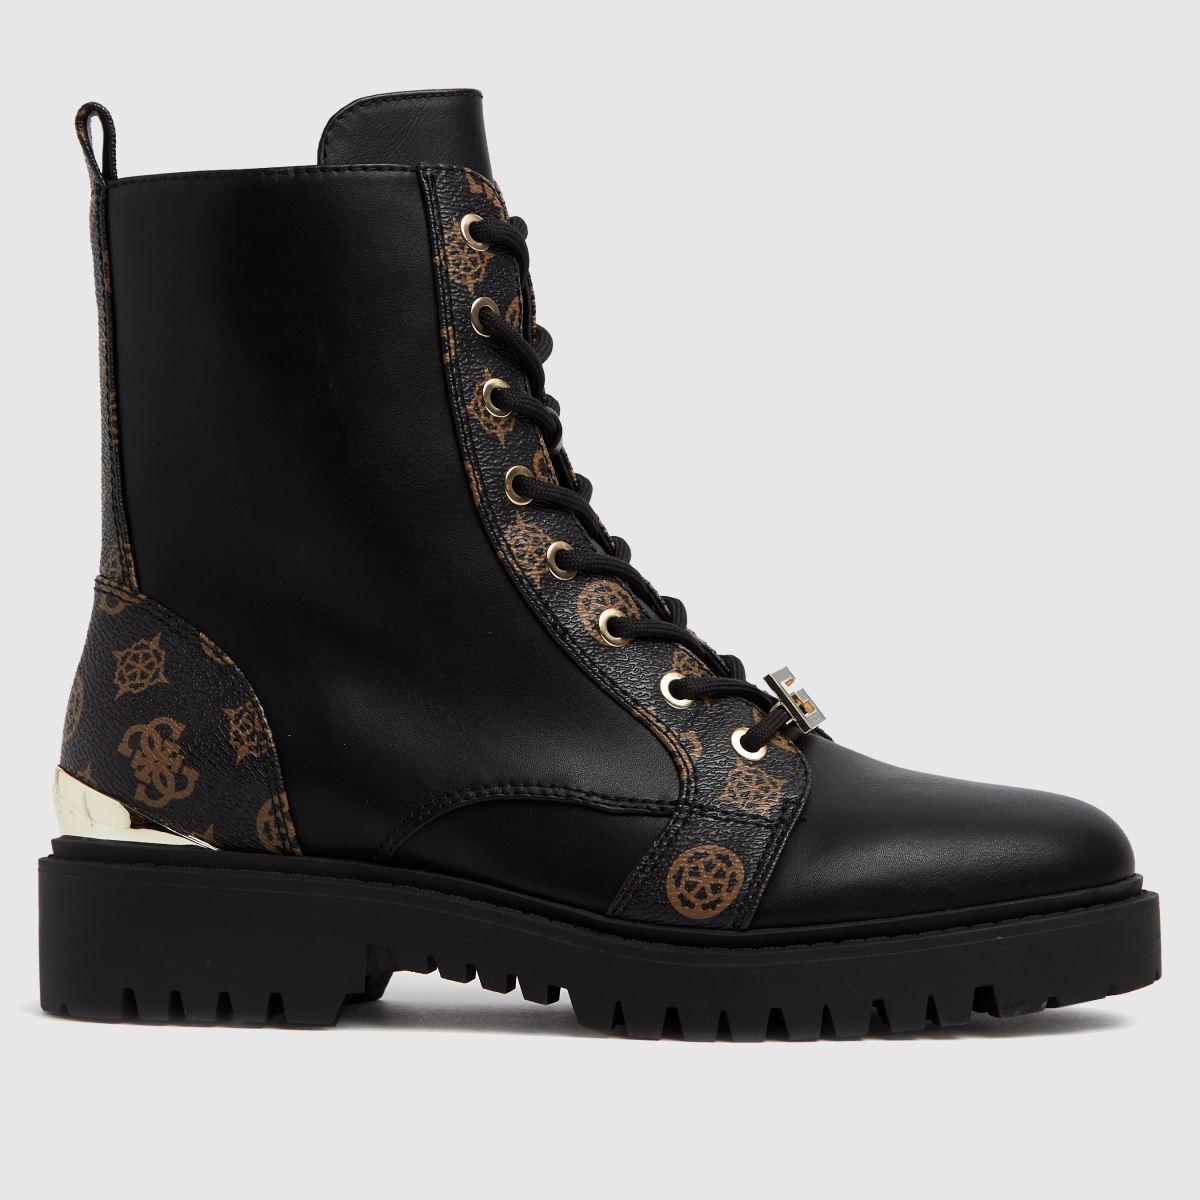 GUESS Black & Brown Omala Boots